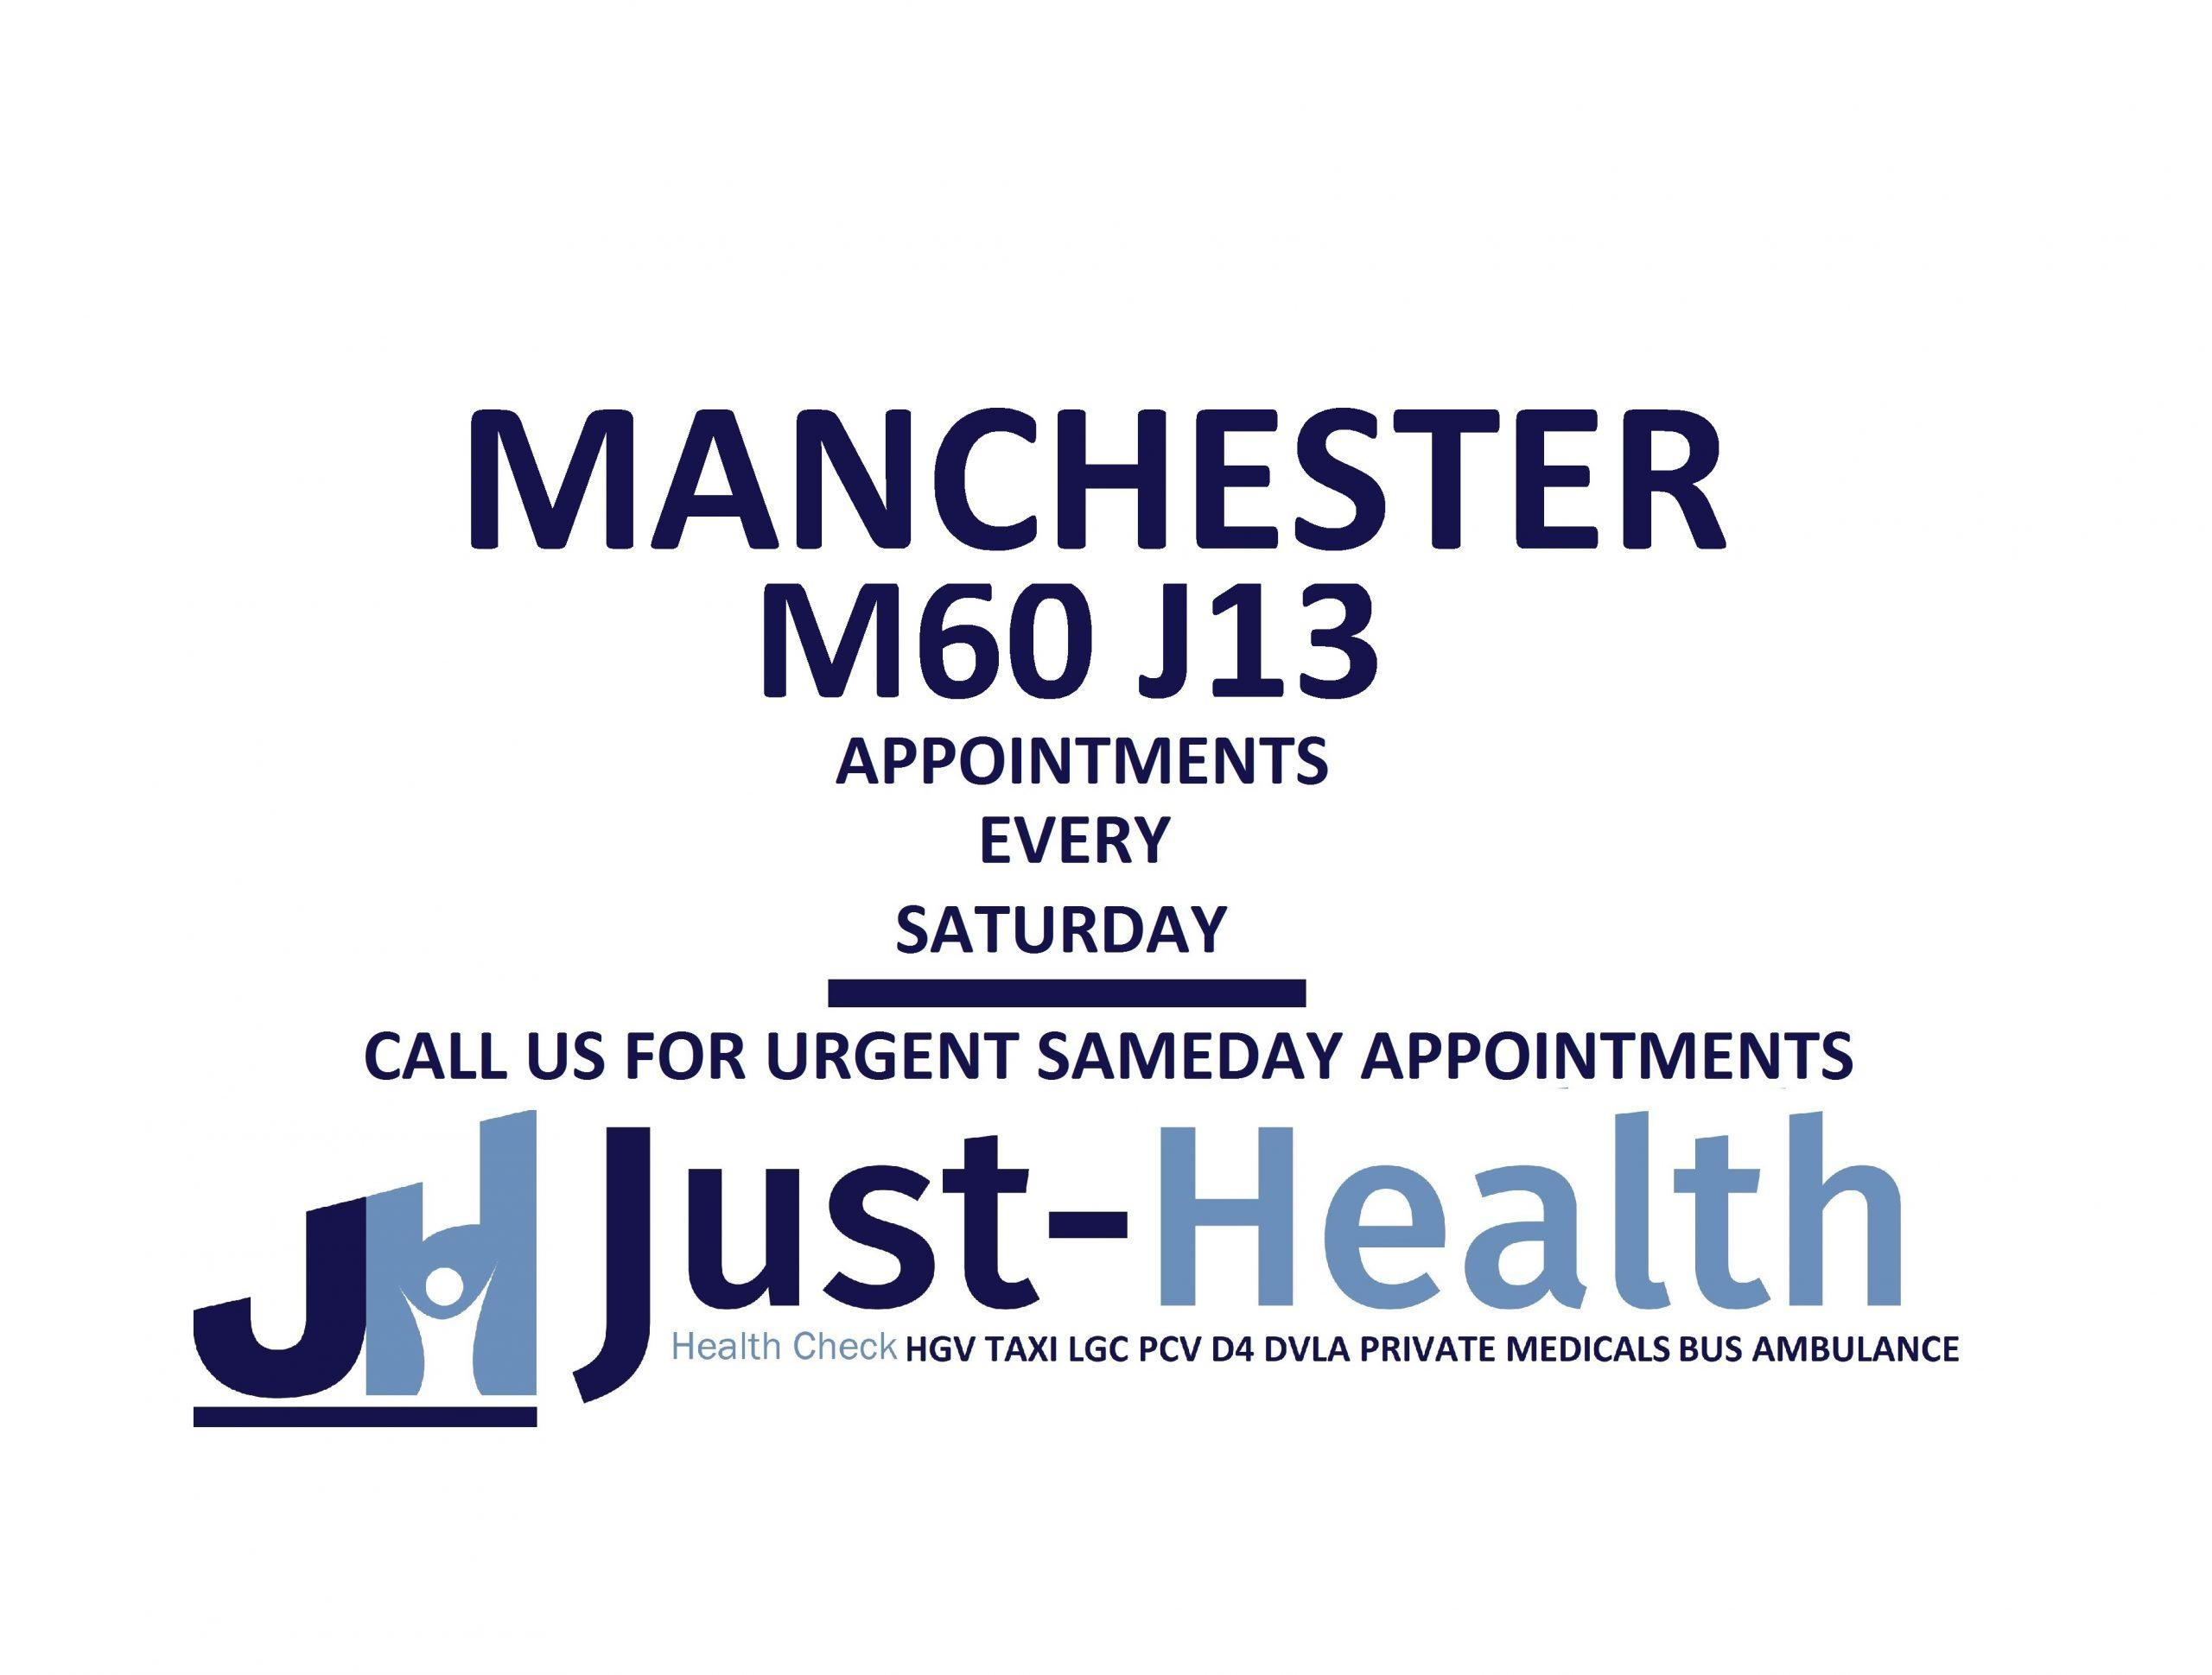 d4 PSV LGV Taxi Pcv HGV medical just health clinic Manchester Sale altrincham Worsley middleton longsight prestwich